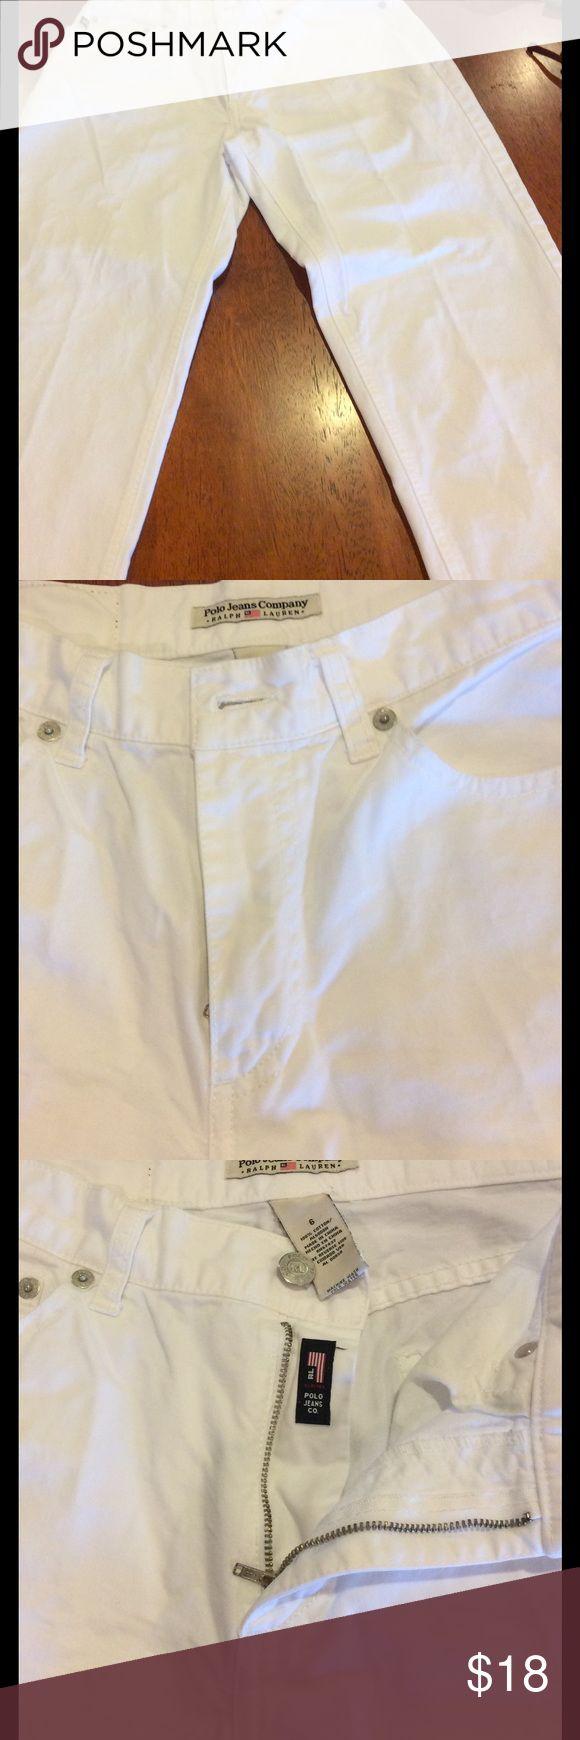 Polo Jeans Ralph Lauren White Capris Polo Jeans Company Ralph Lauren White jeans Capris size 6. Polo by Ralph Lauren Pants Capris